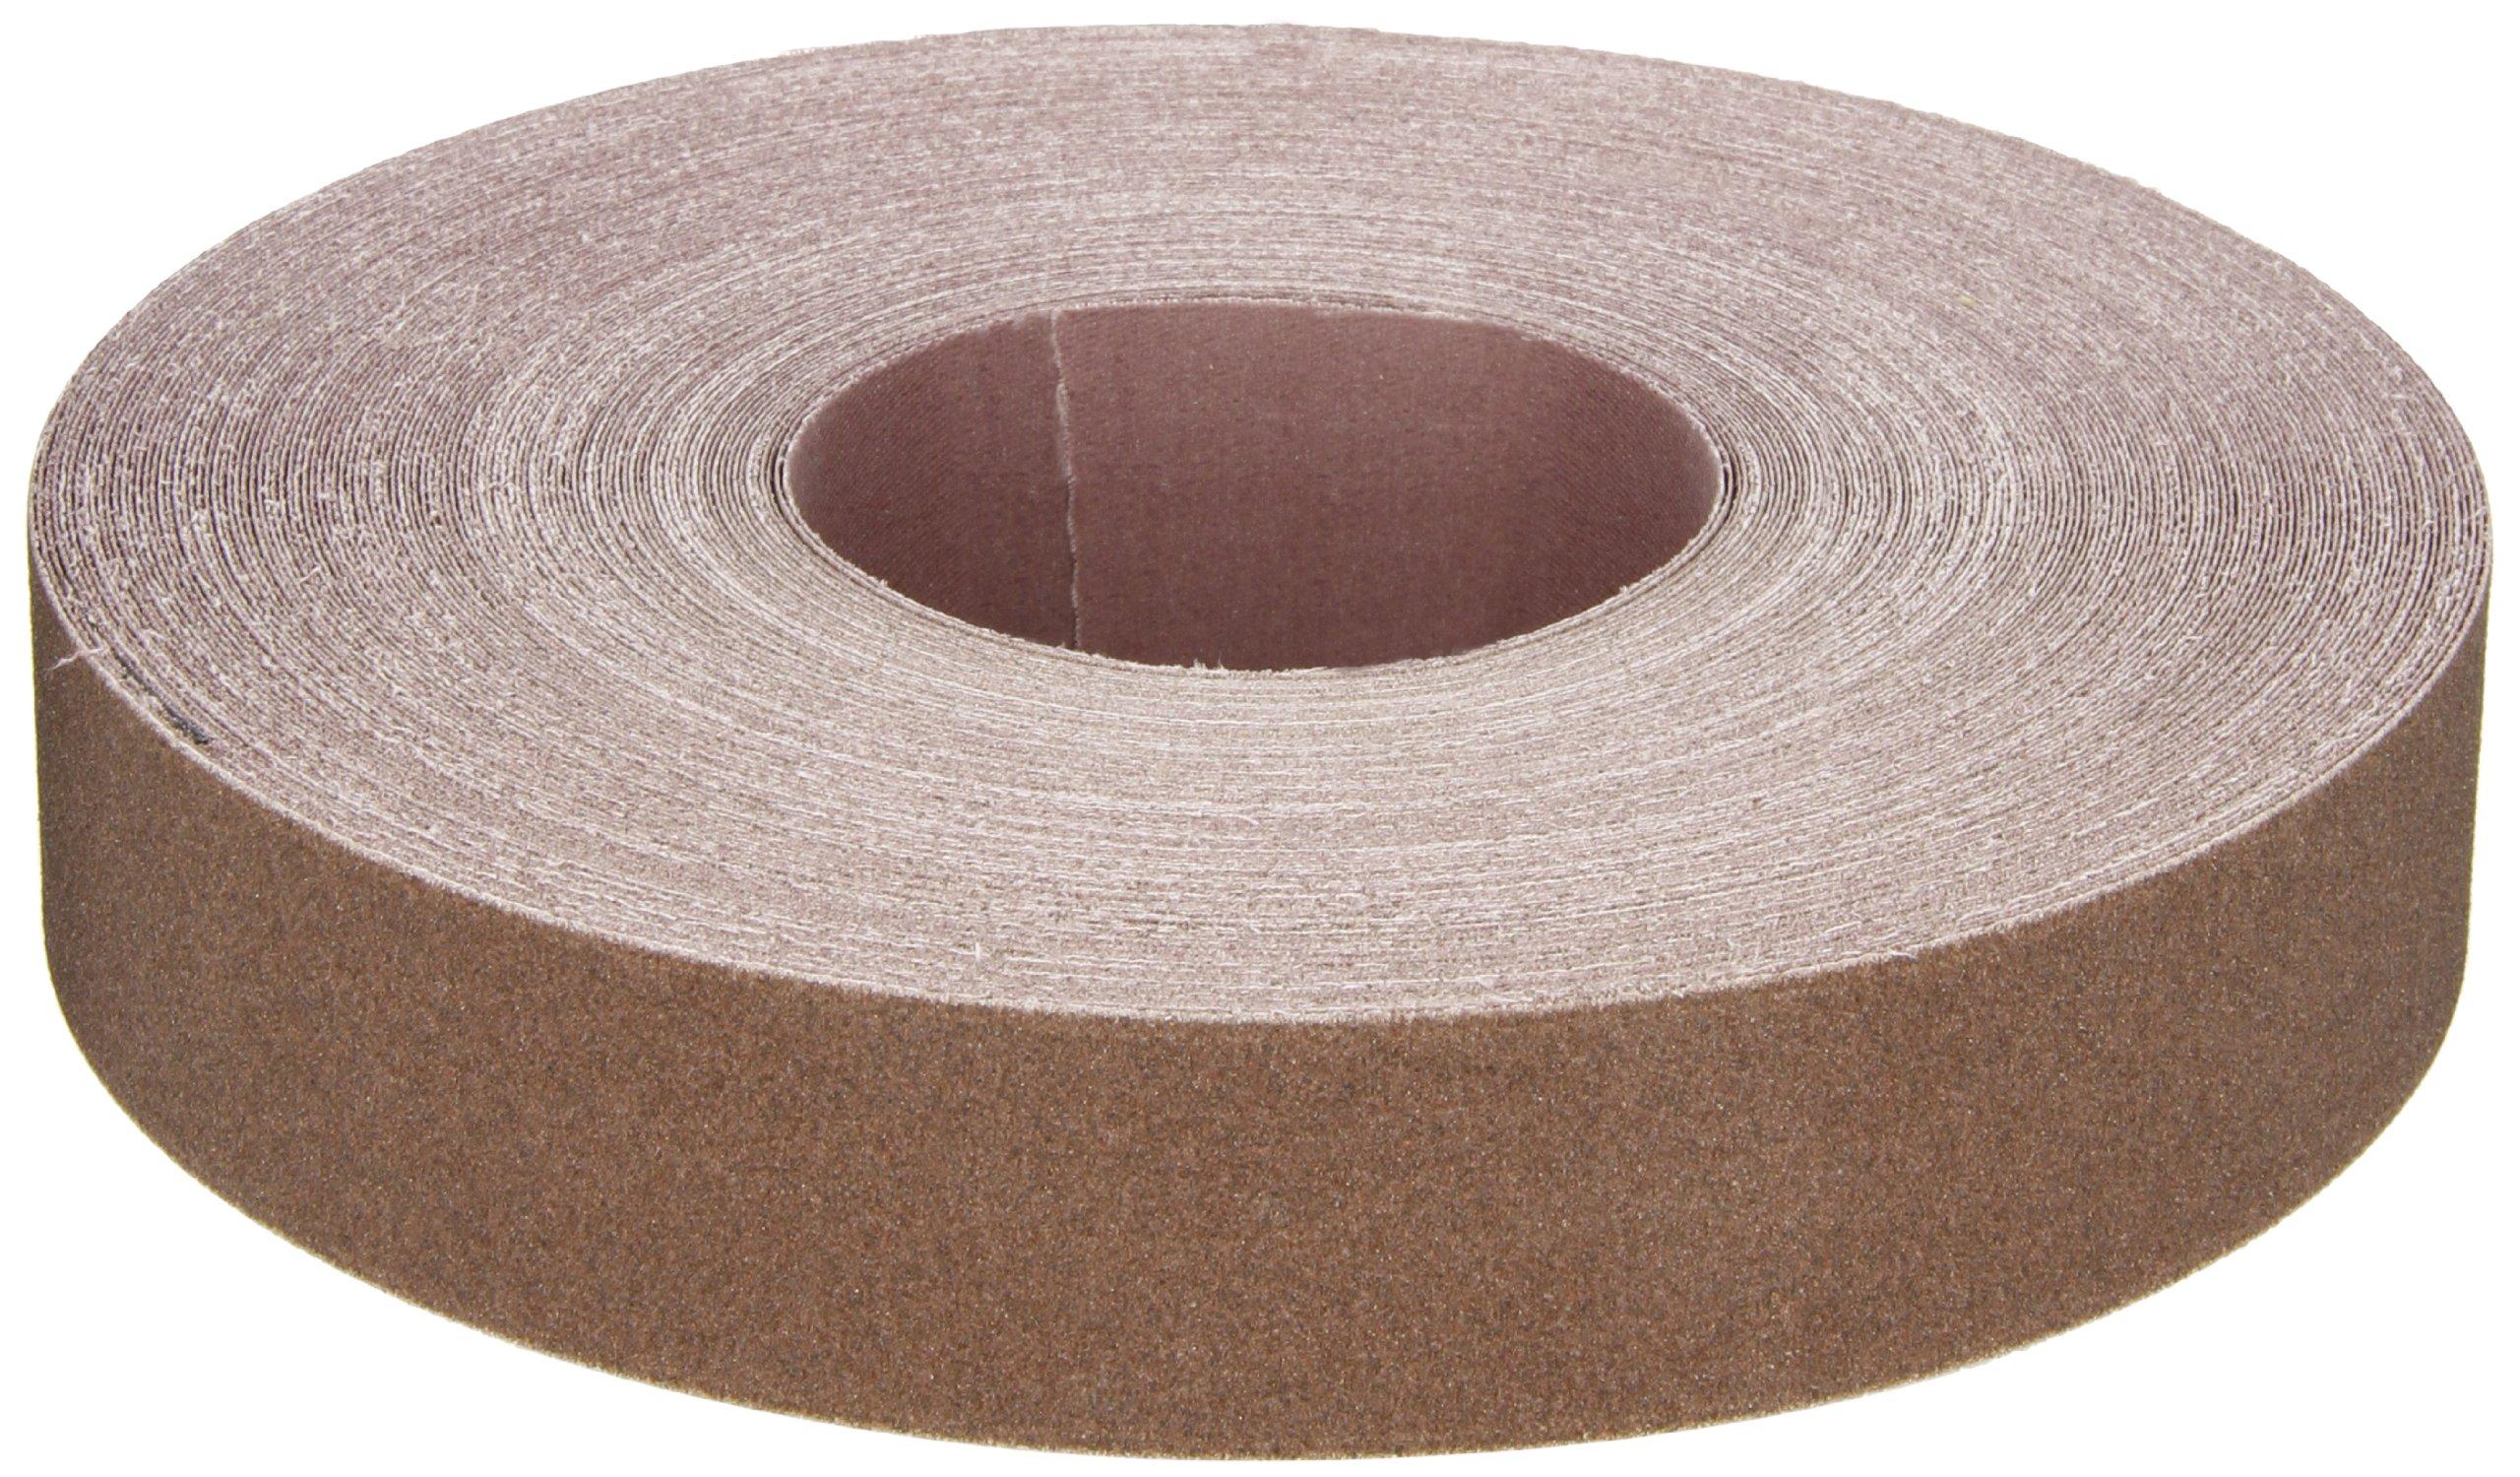 Norton K225 Metalite Abrasive Roll, Cloth Backing, Aluminum Oxide, 1-1/2'' Width x 50yd Length, Grit P120